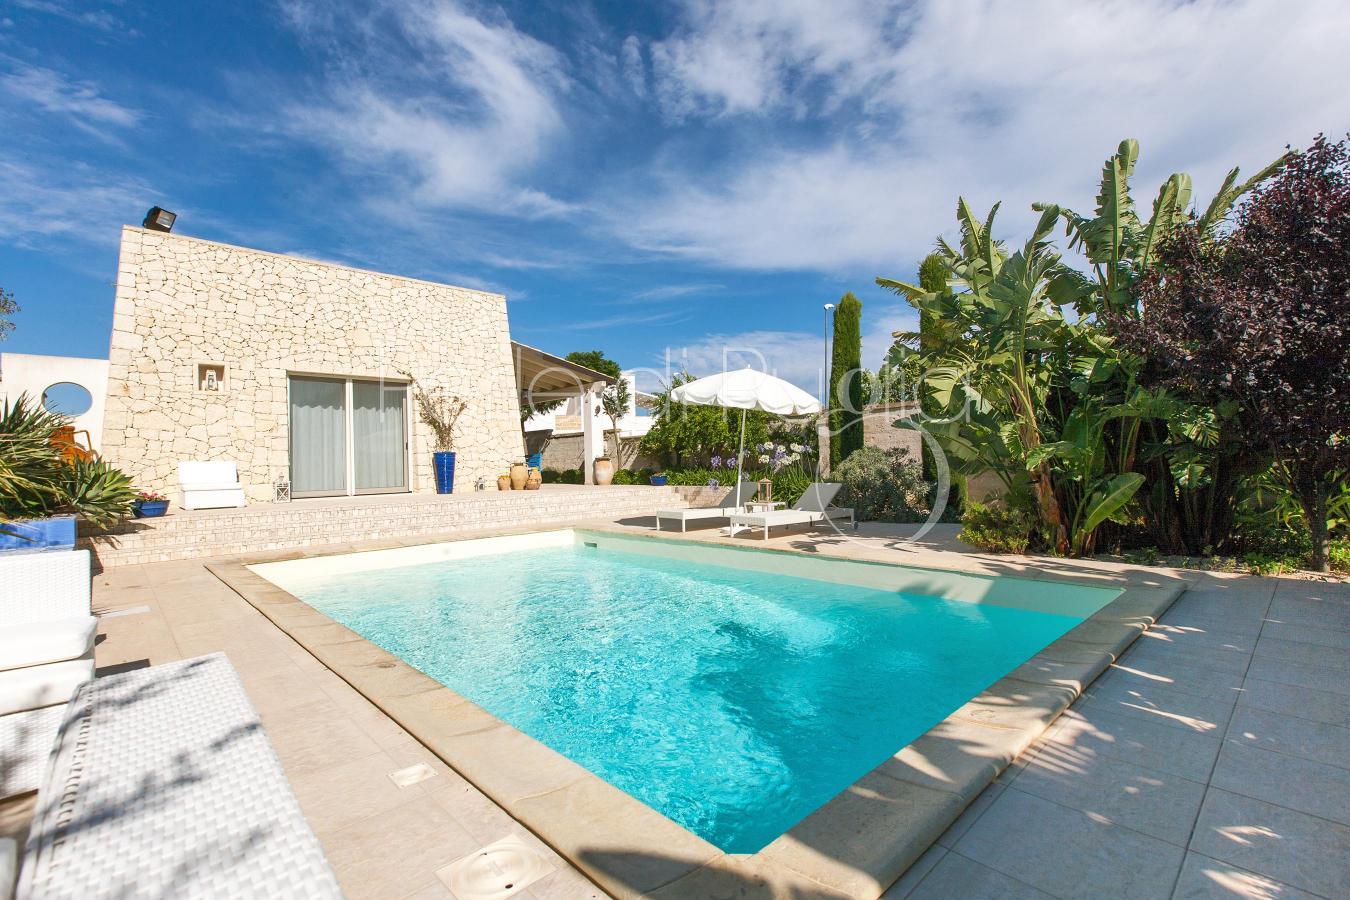 Villa con piscina in affitto a mancaversa villa lia - Villa in affitto con piscina ...